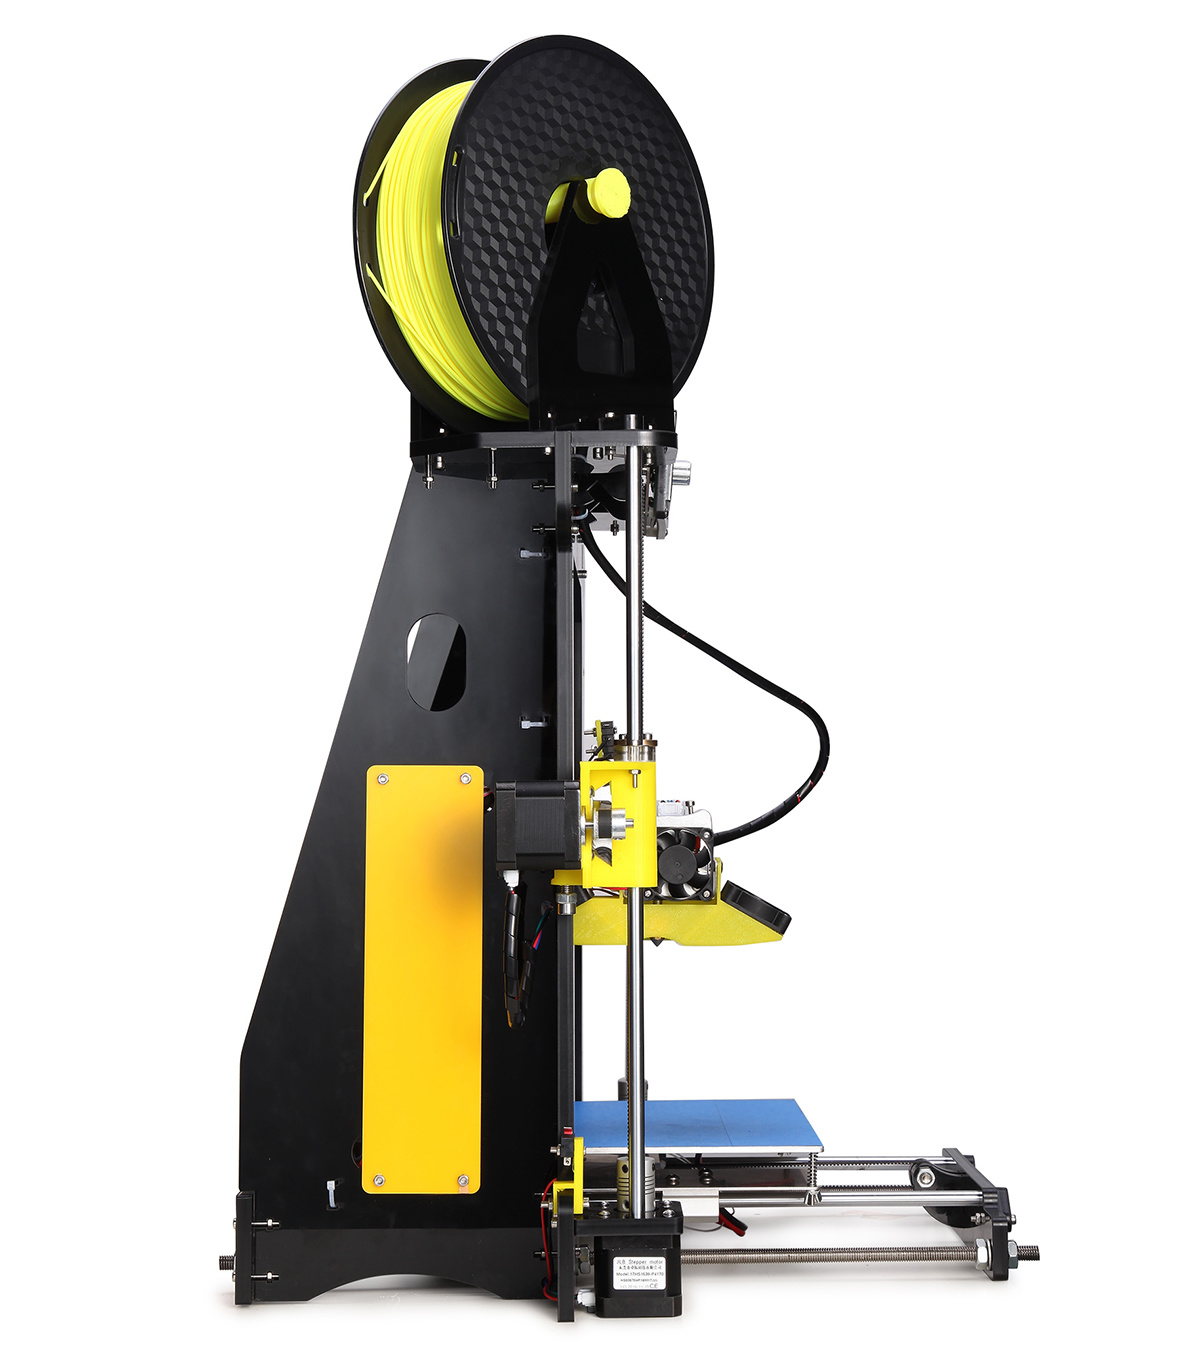 New Version Reprap Prusa I3 Desktop Fdm DIY 3D Printer